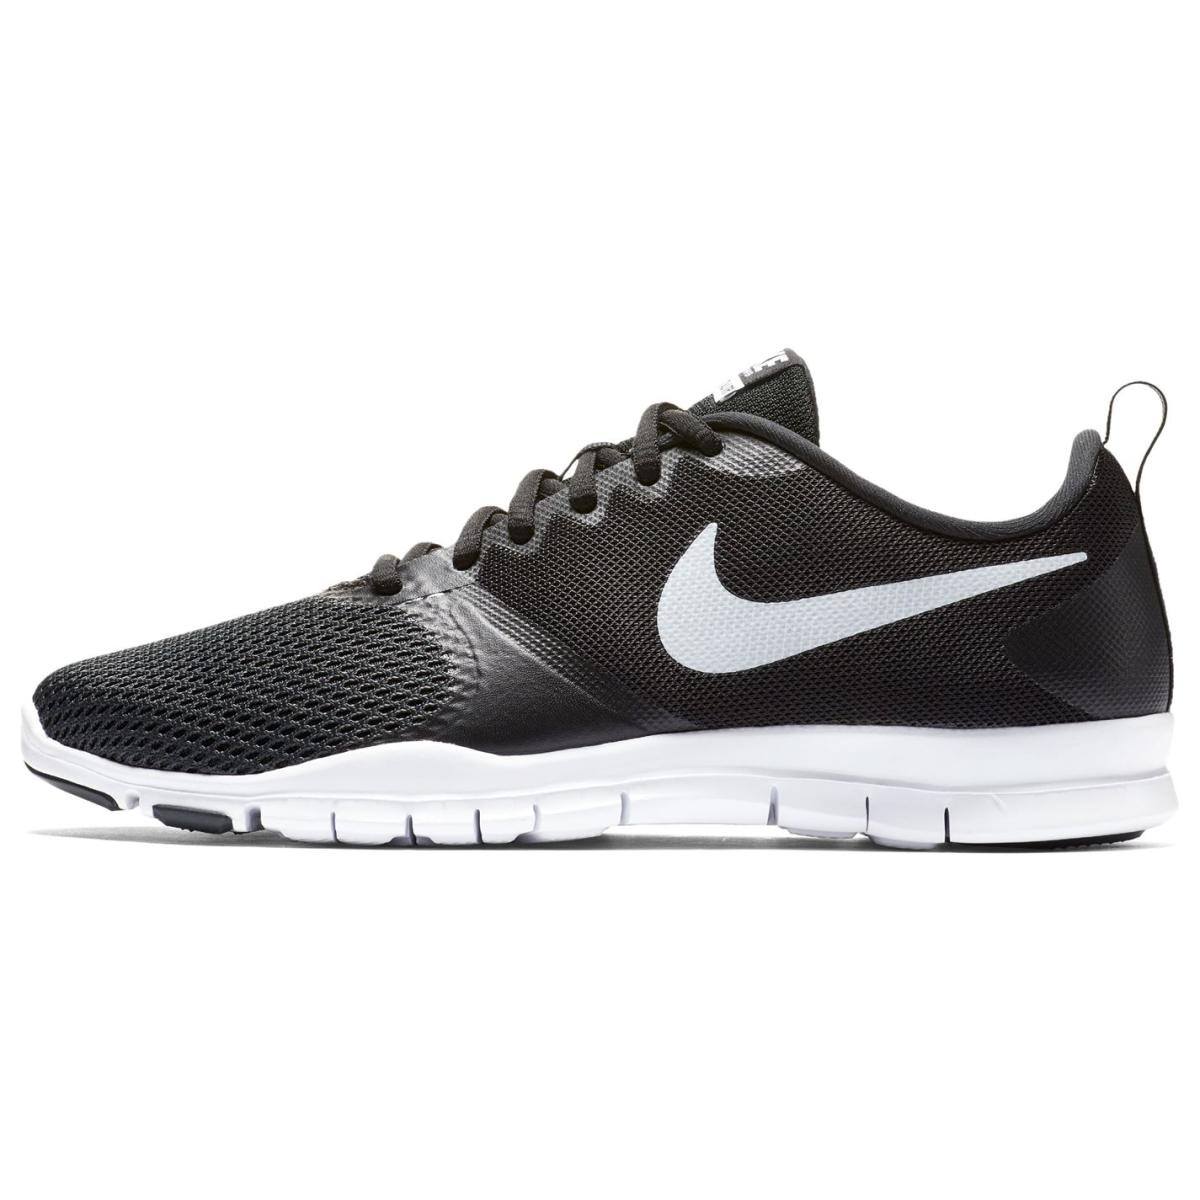 Nike-Flex-Laufschuhe-Turnschuhe-Damen-Sneaker-Sportschuhe-Jogging-3088 Indexbild 4